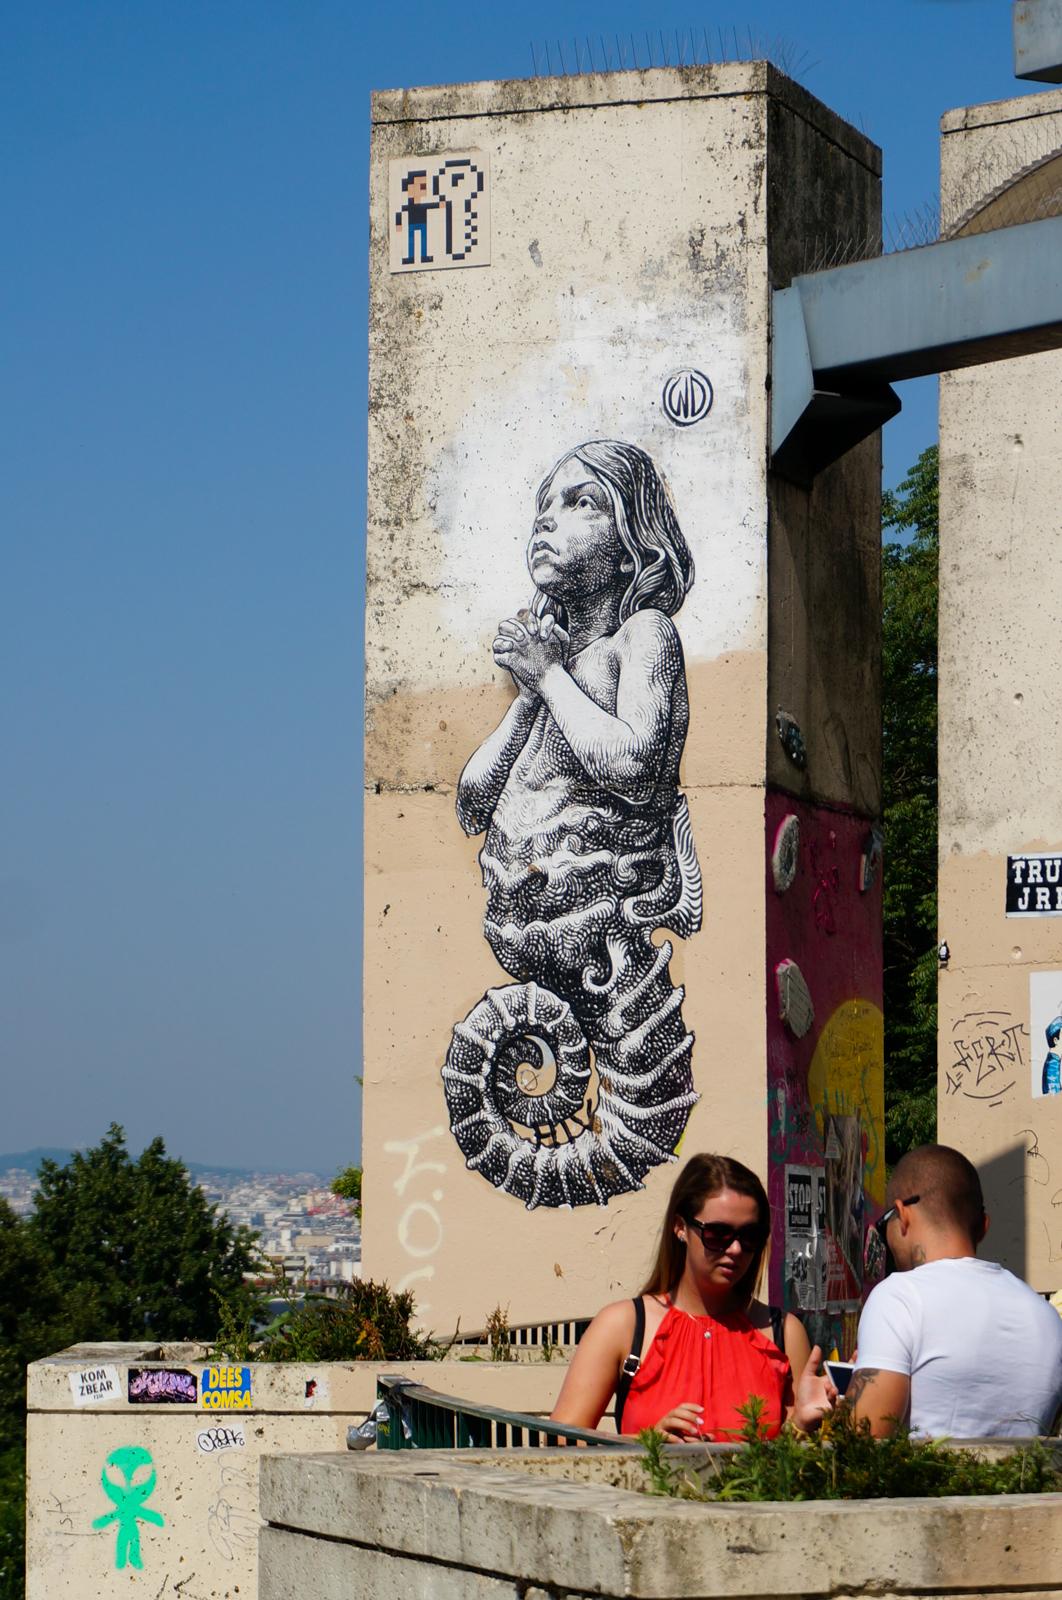 belleville, impasses secrètes paris, impasses paris 20, paris caché, paris secret, paris vert, paris village, paris différent, paris secret, paris street art, urban art paris, art urbain paris, graffitti paris